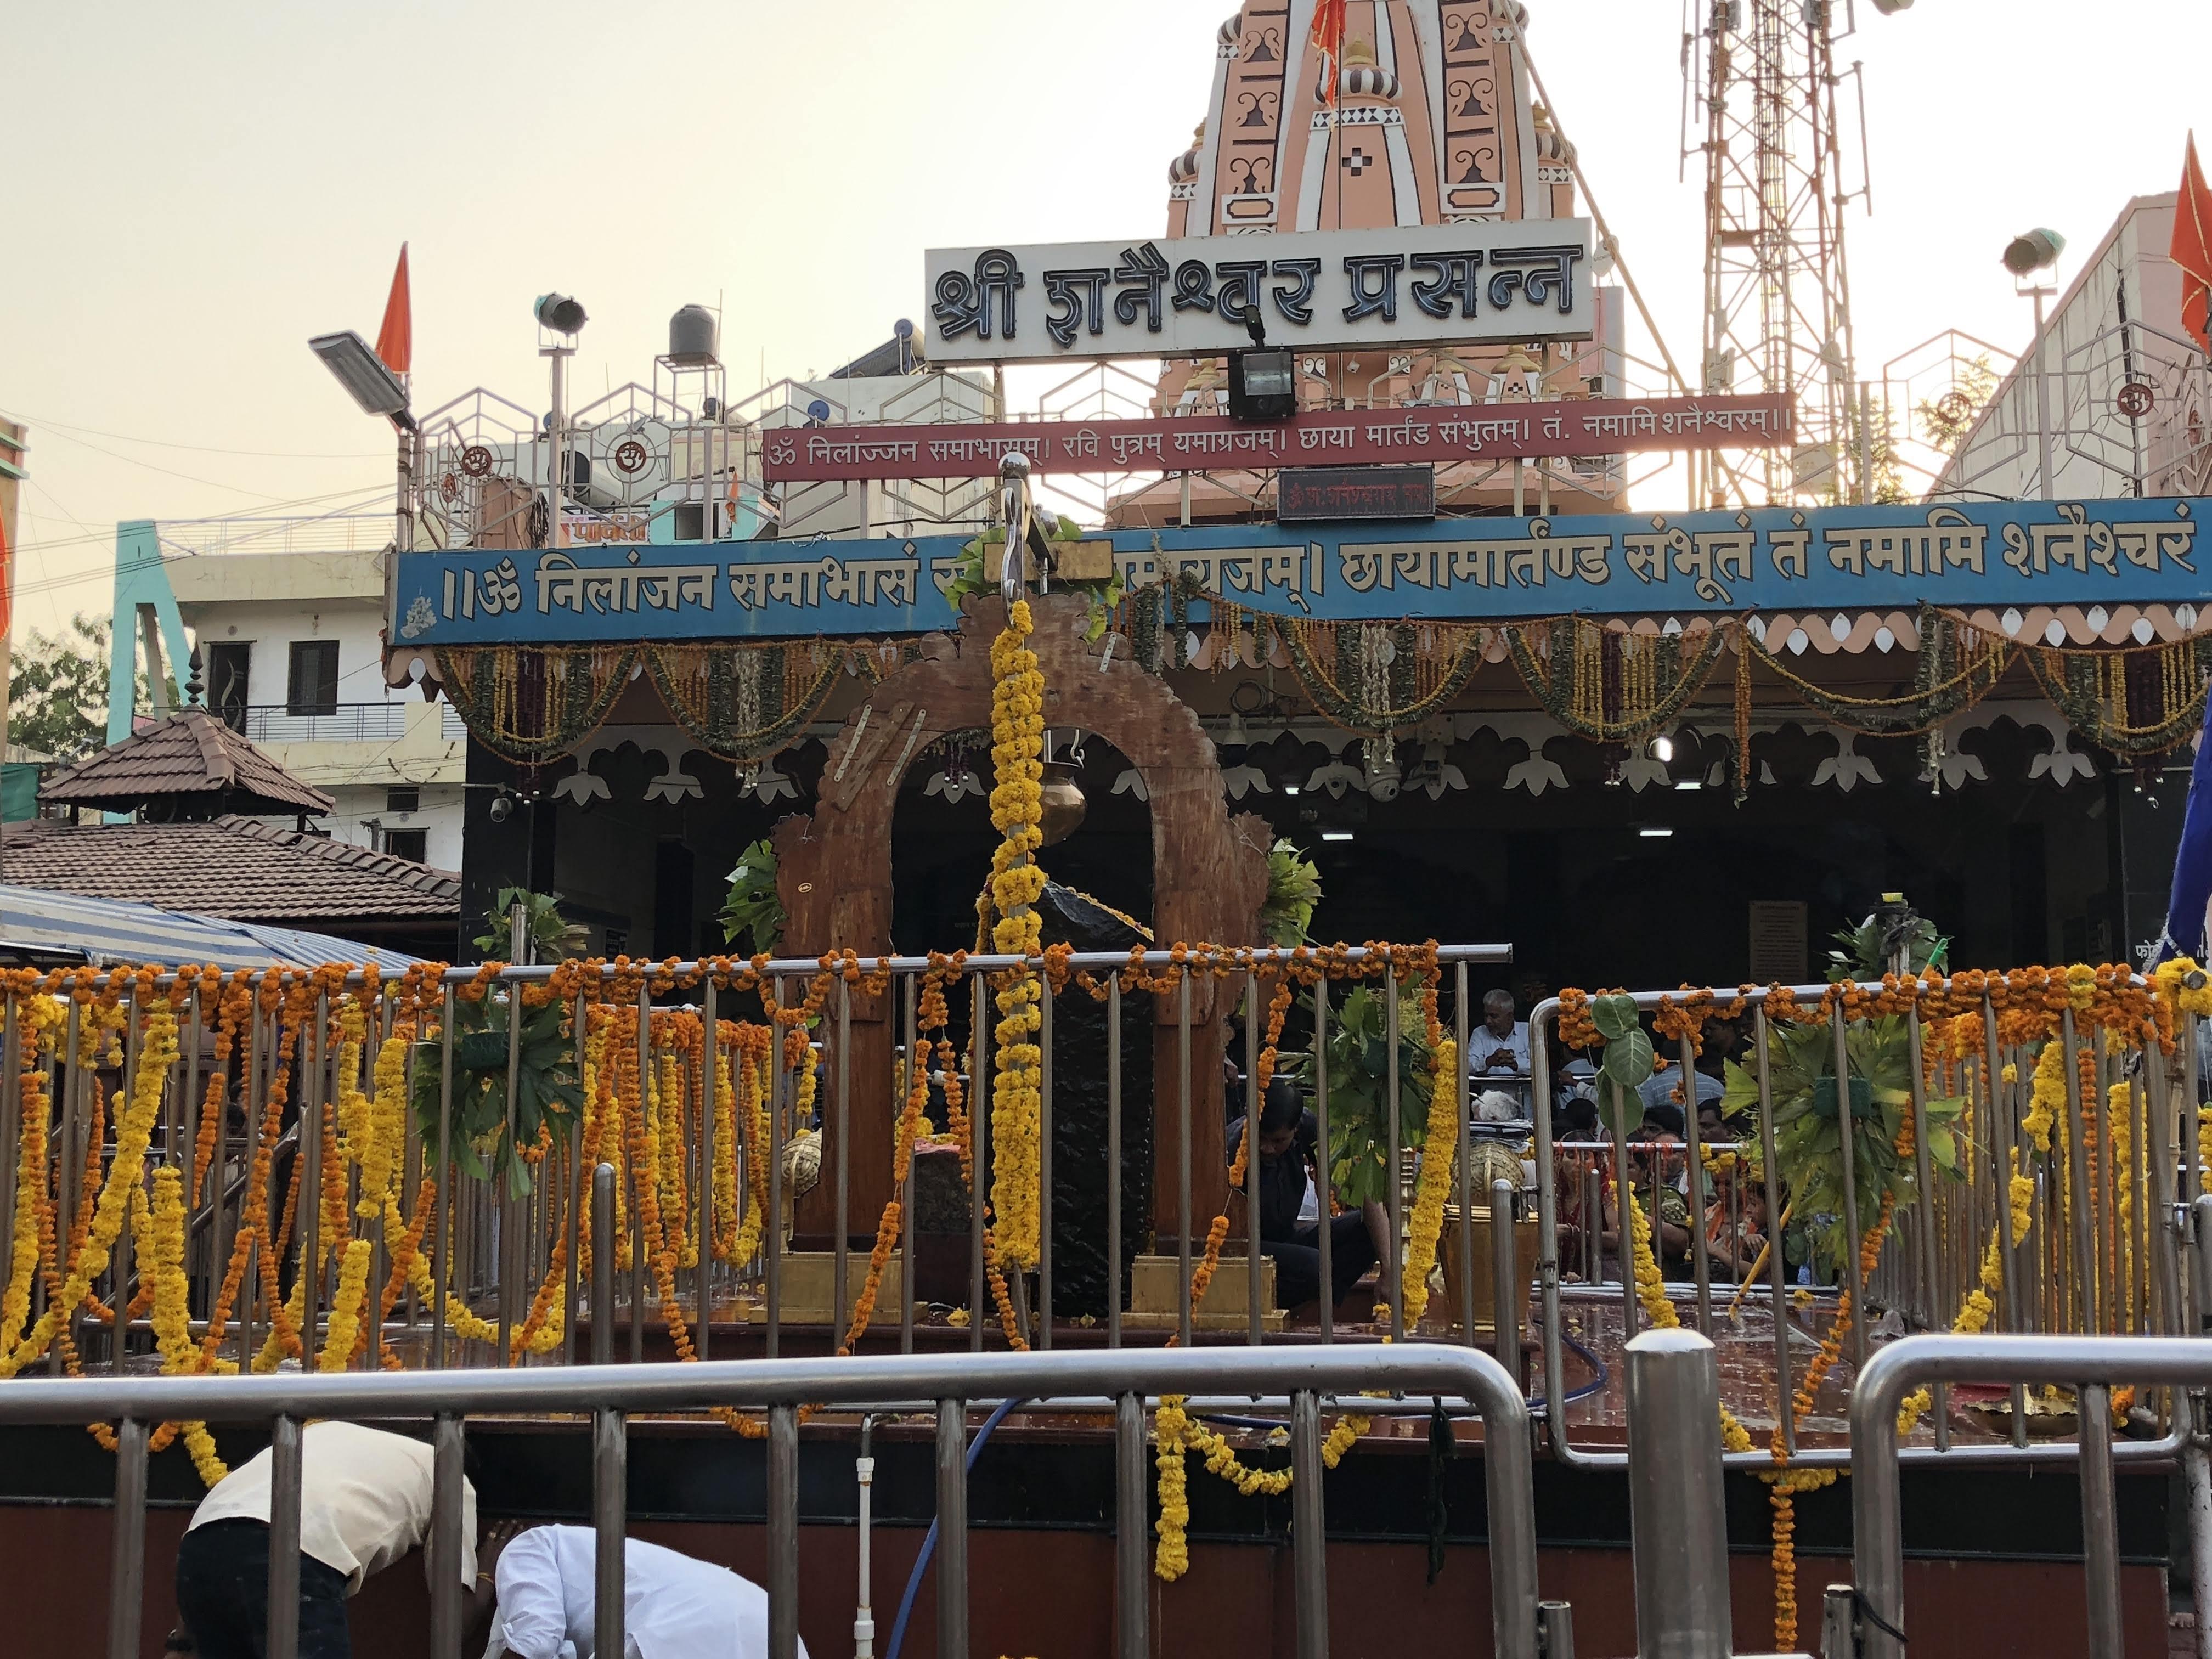 Shani Shingnapur Temple in Maharashtra